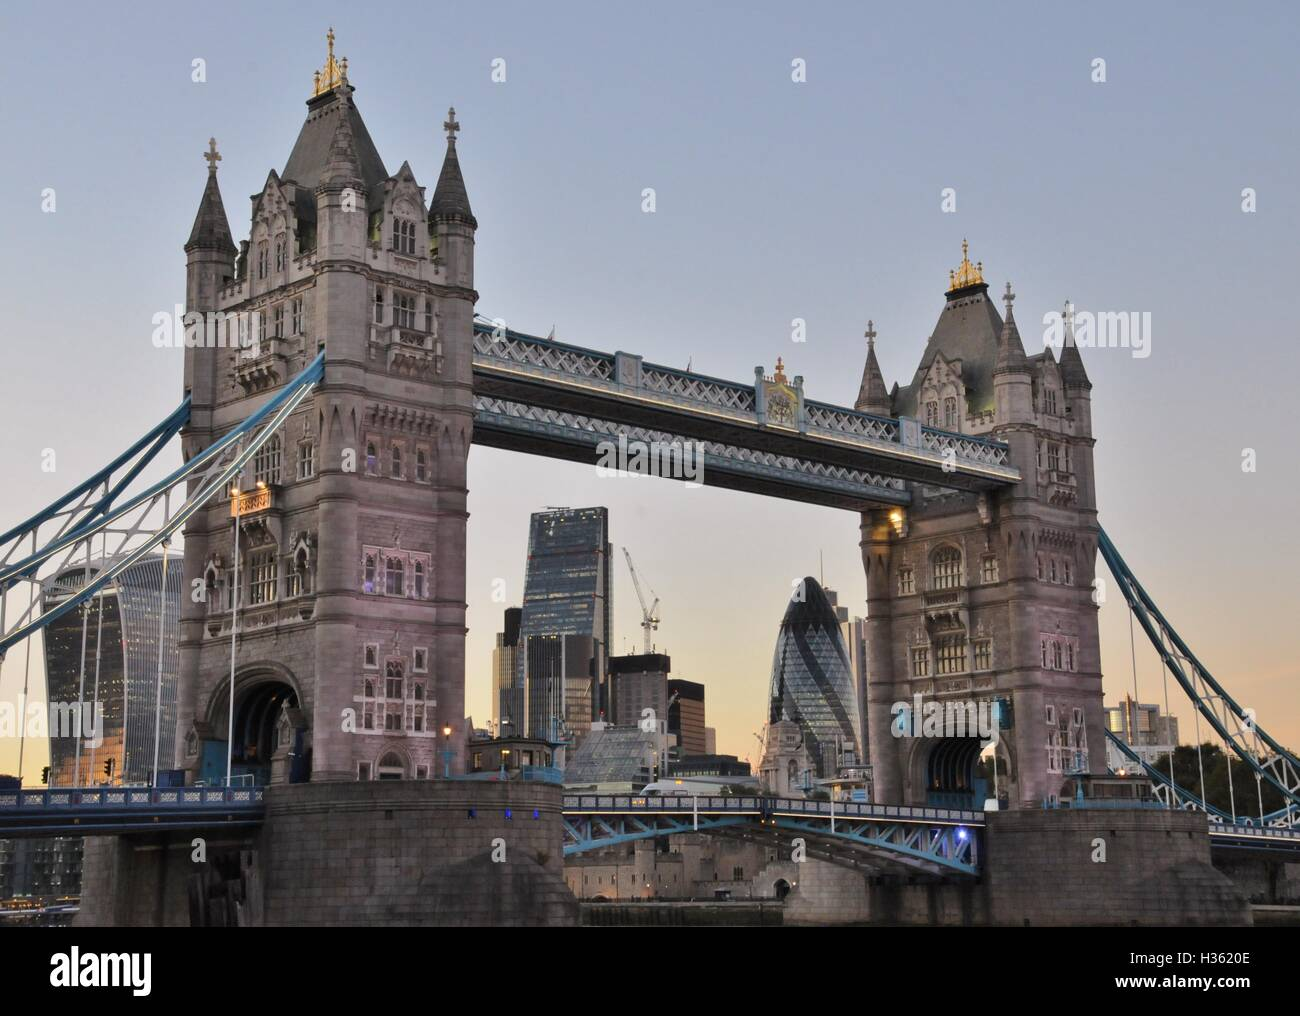 London's Tower Bridge and modern London. - Stock Image